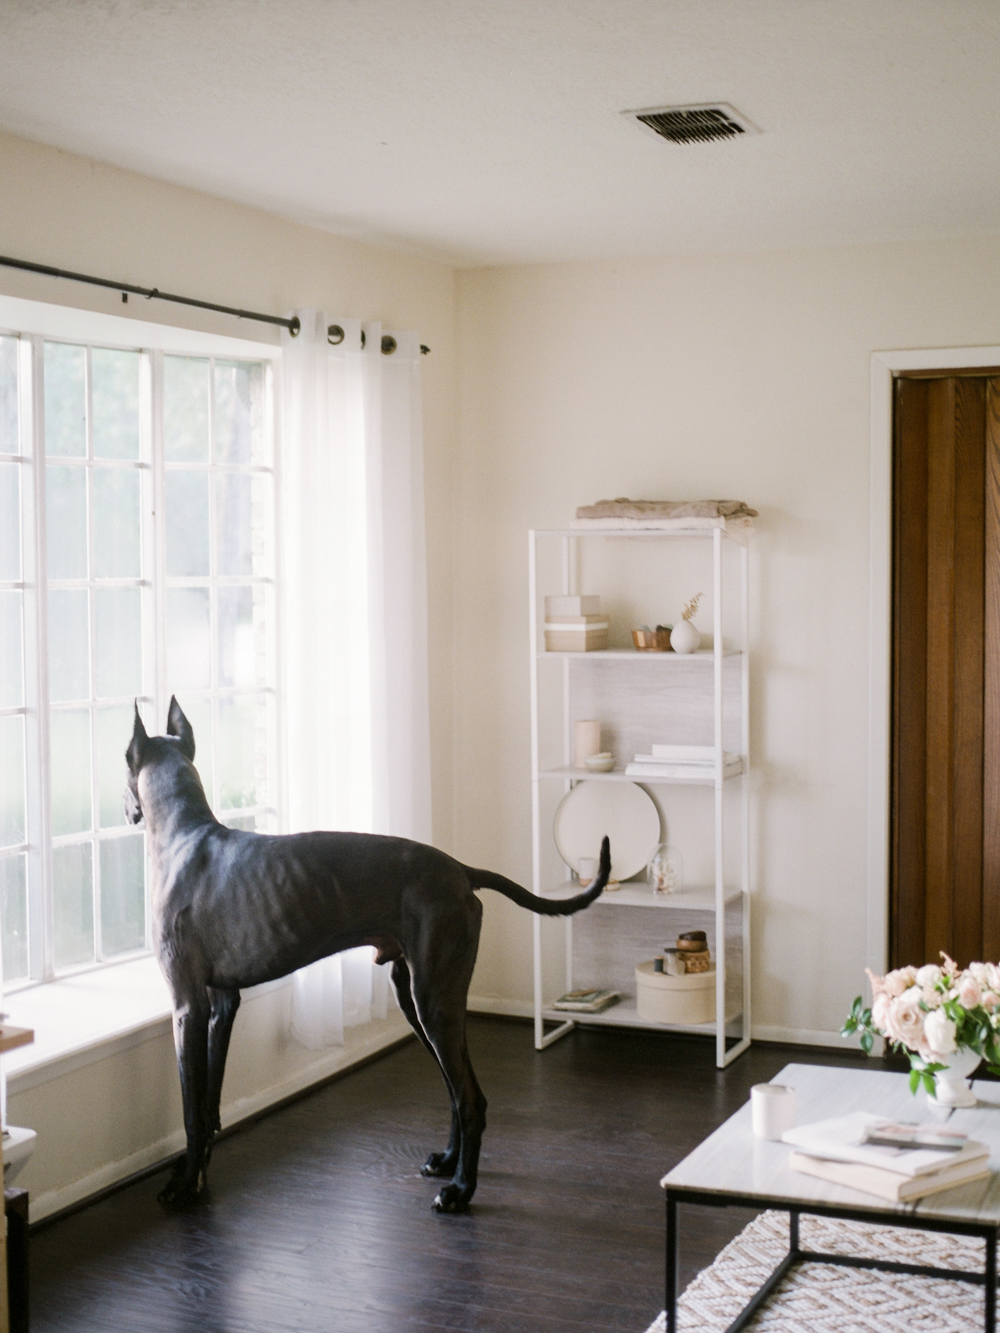 Houston wedding photographers - Houston product photography - Christine Gosch - minimalist office inspiration - film photographer-4.jpg